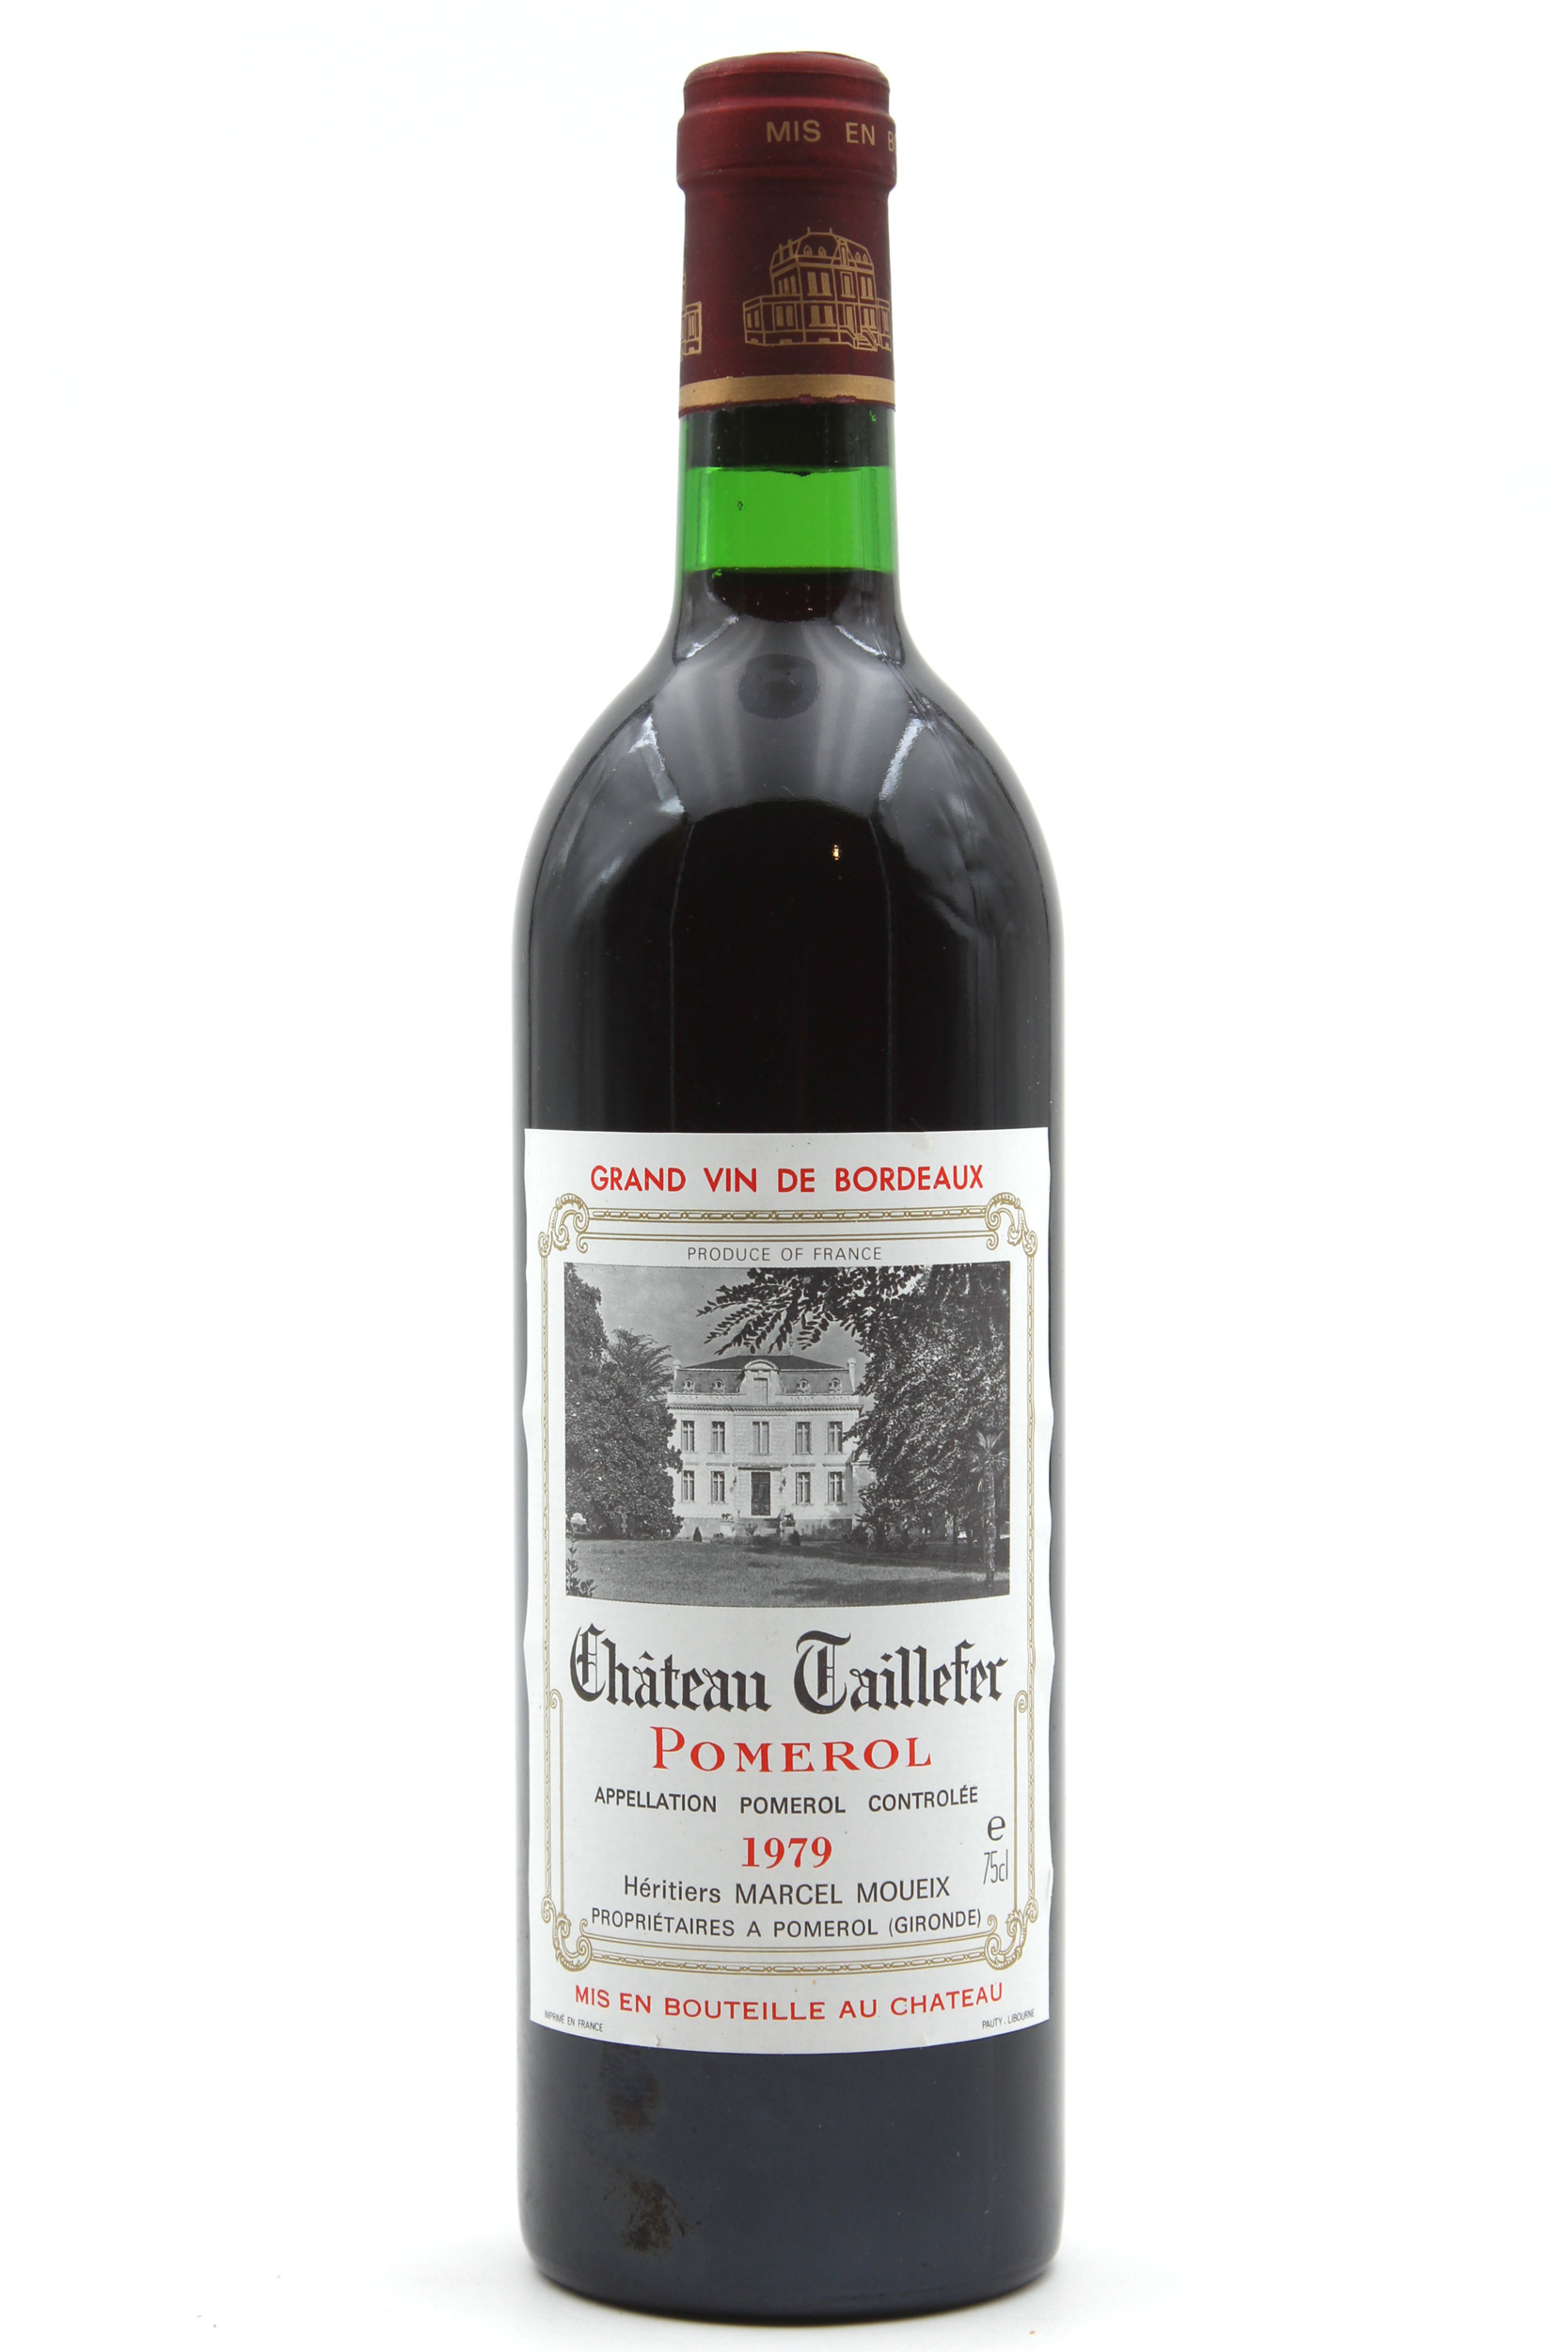 Château Taillefer 1979 Rouge 75cl AOC Pomerol